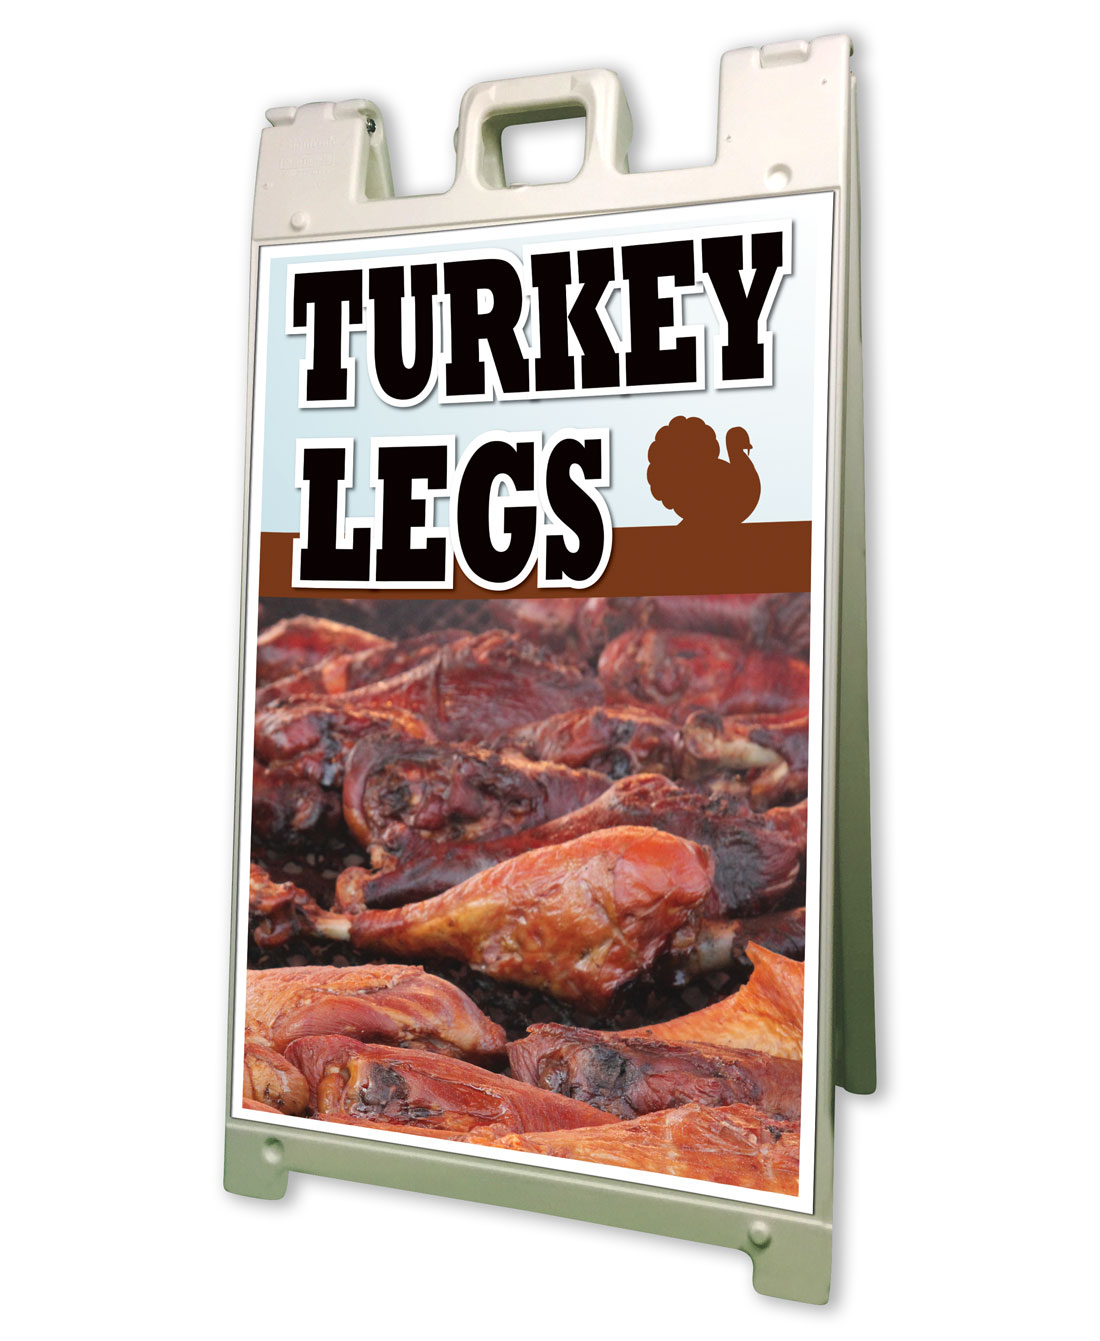 Turkey Legs Sidewalk A Frame 24x36 Concession Stand Outdoor